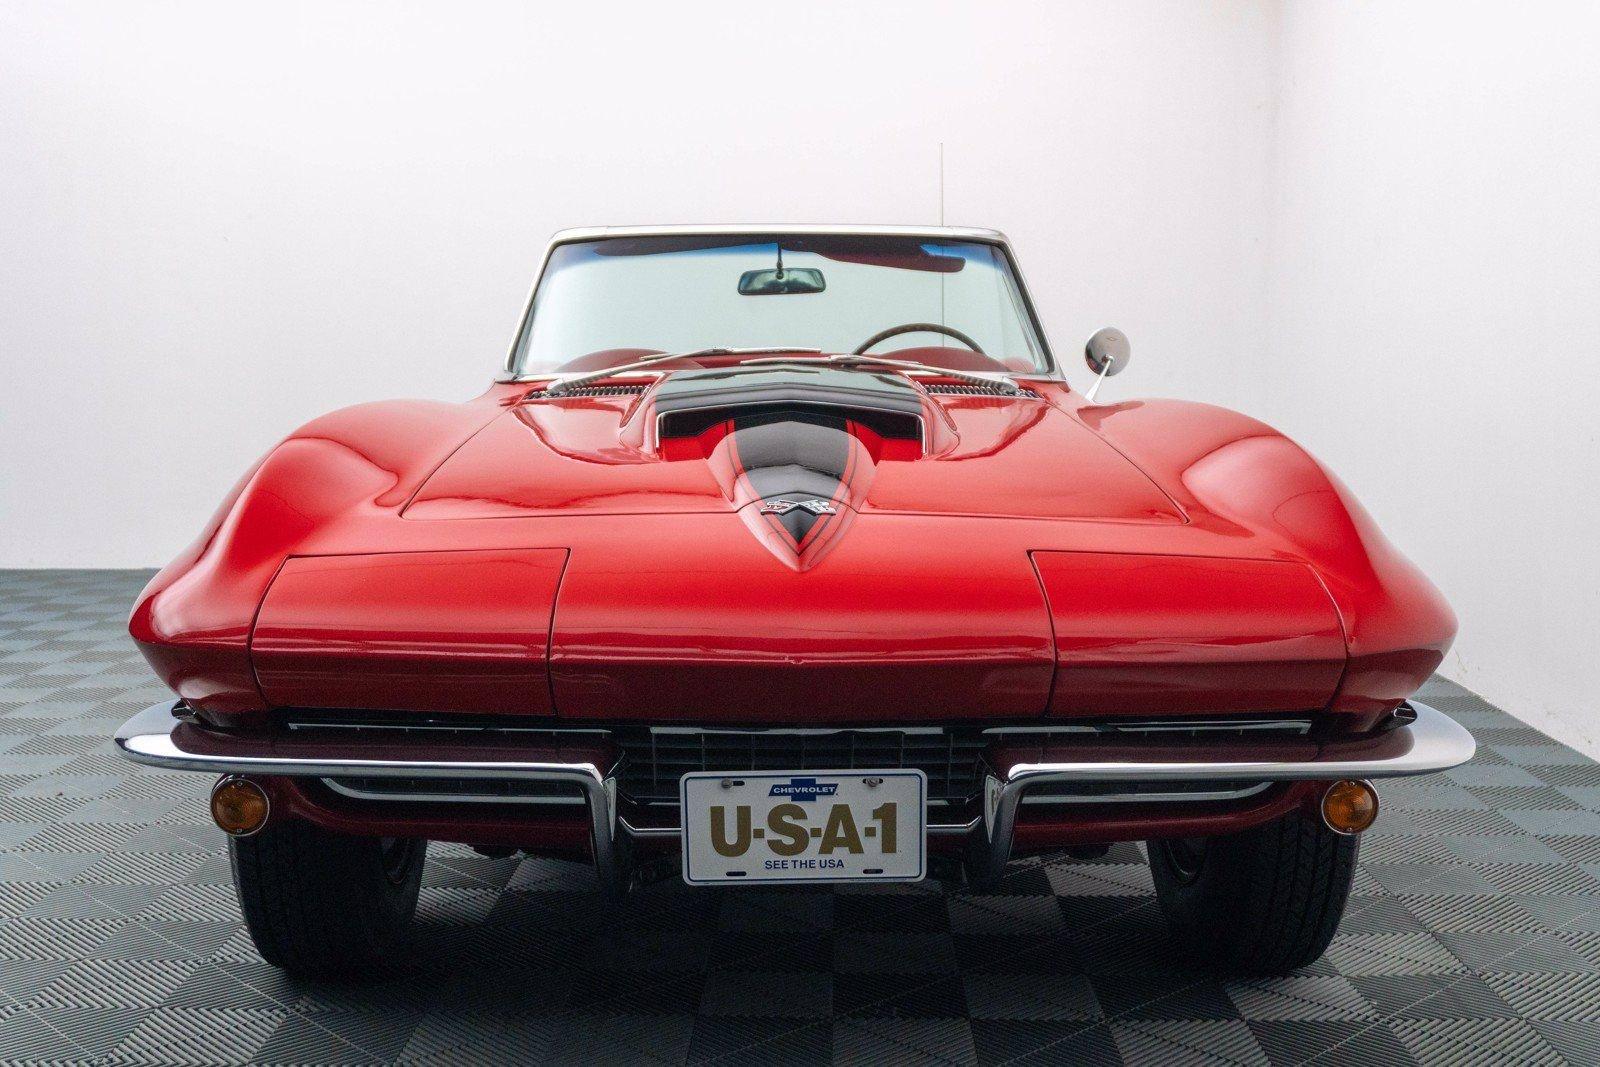 1967 Chevrolet Corvette Stingray Fuel Injection